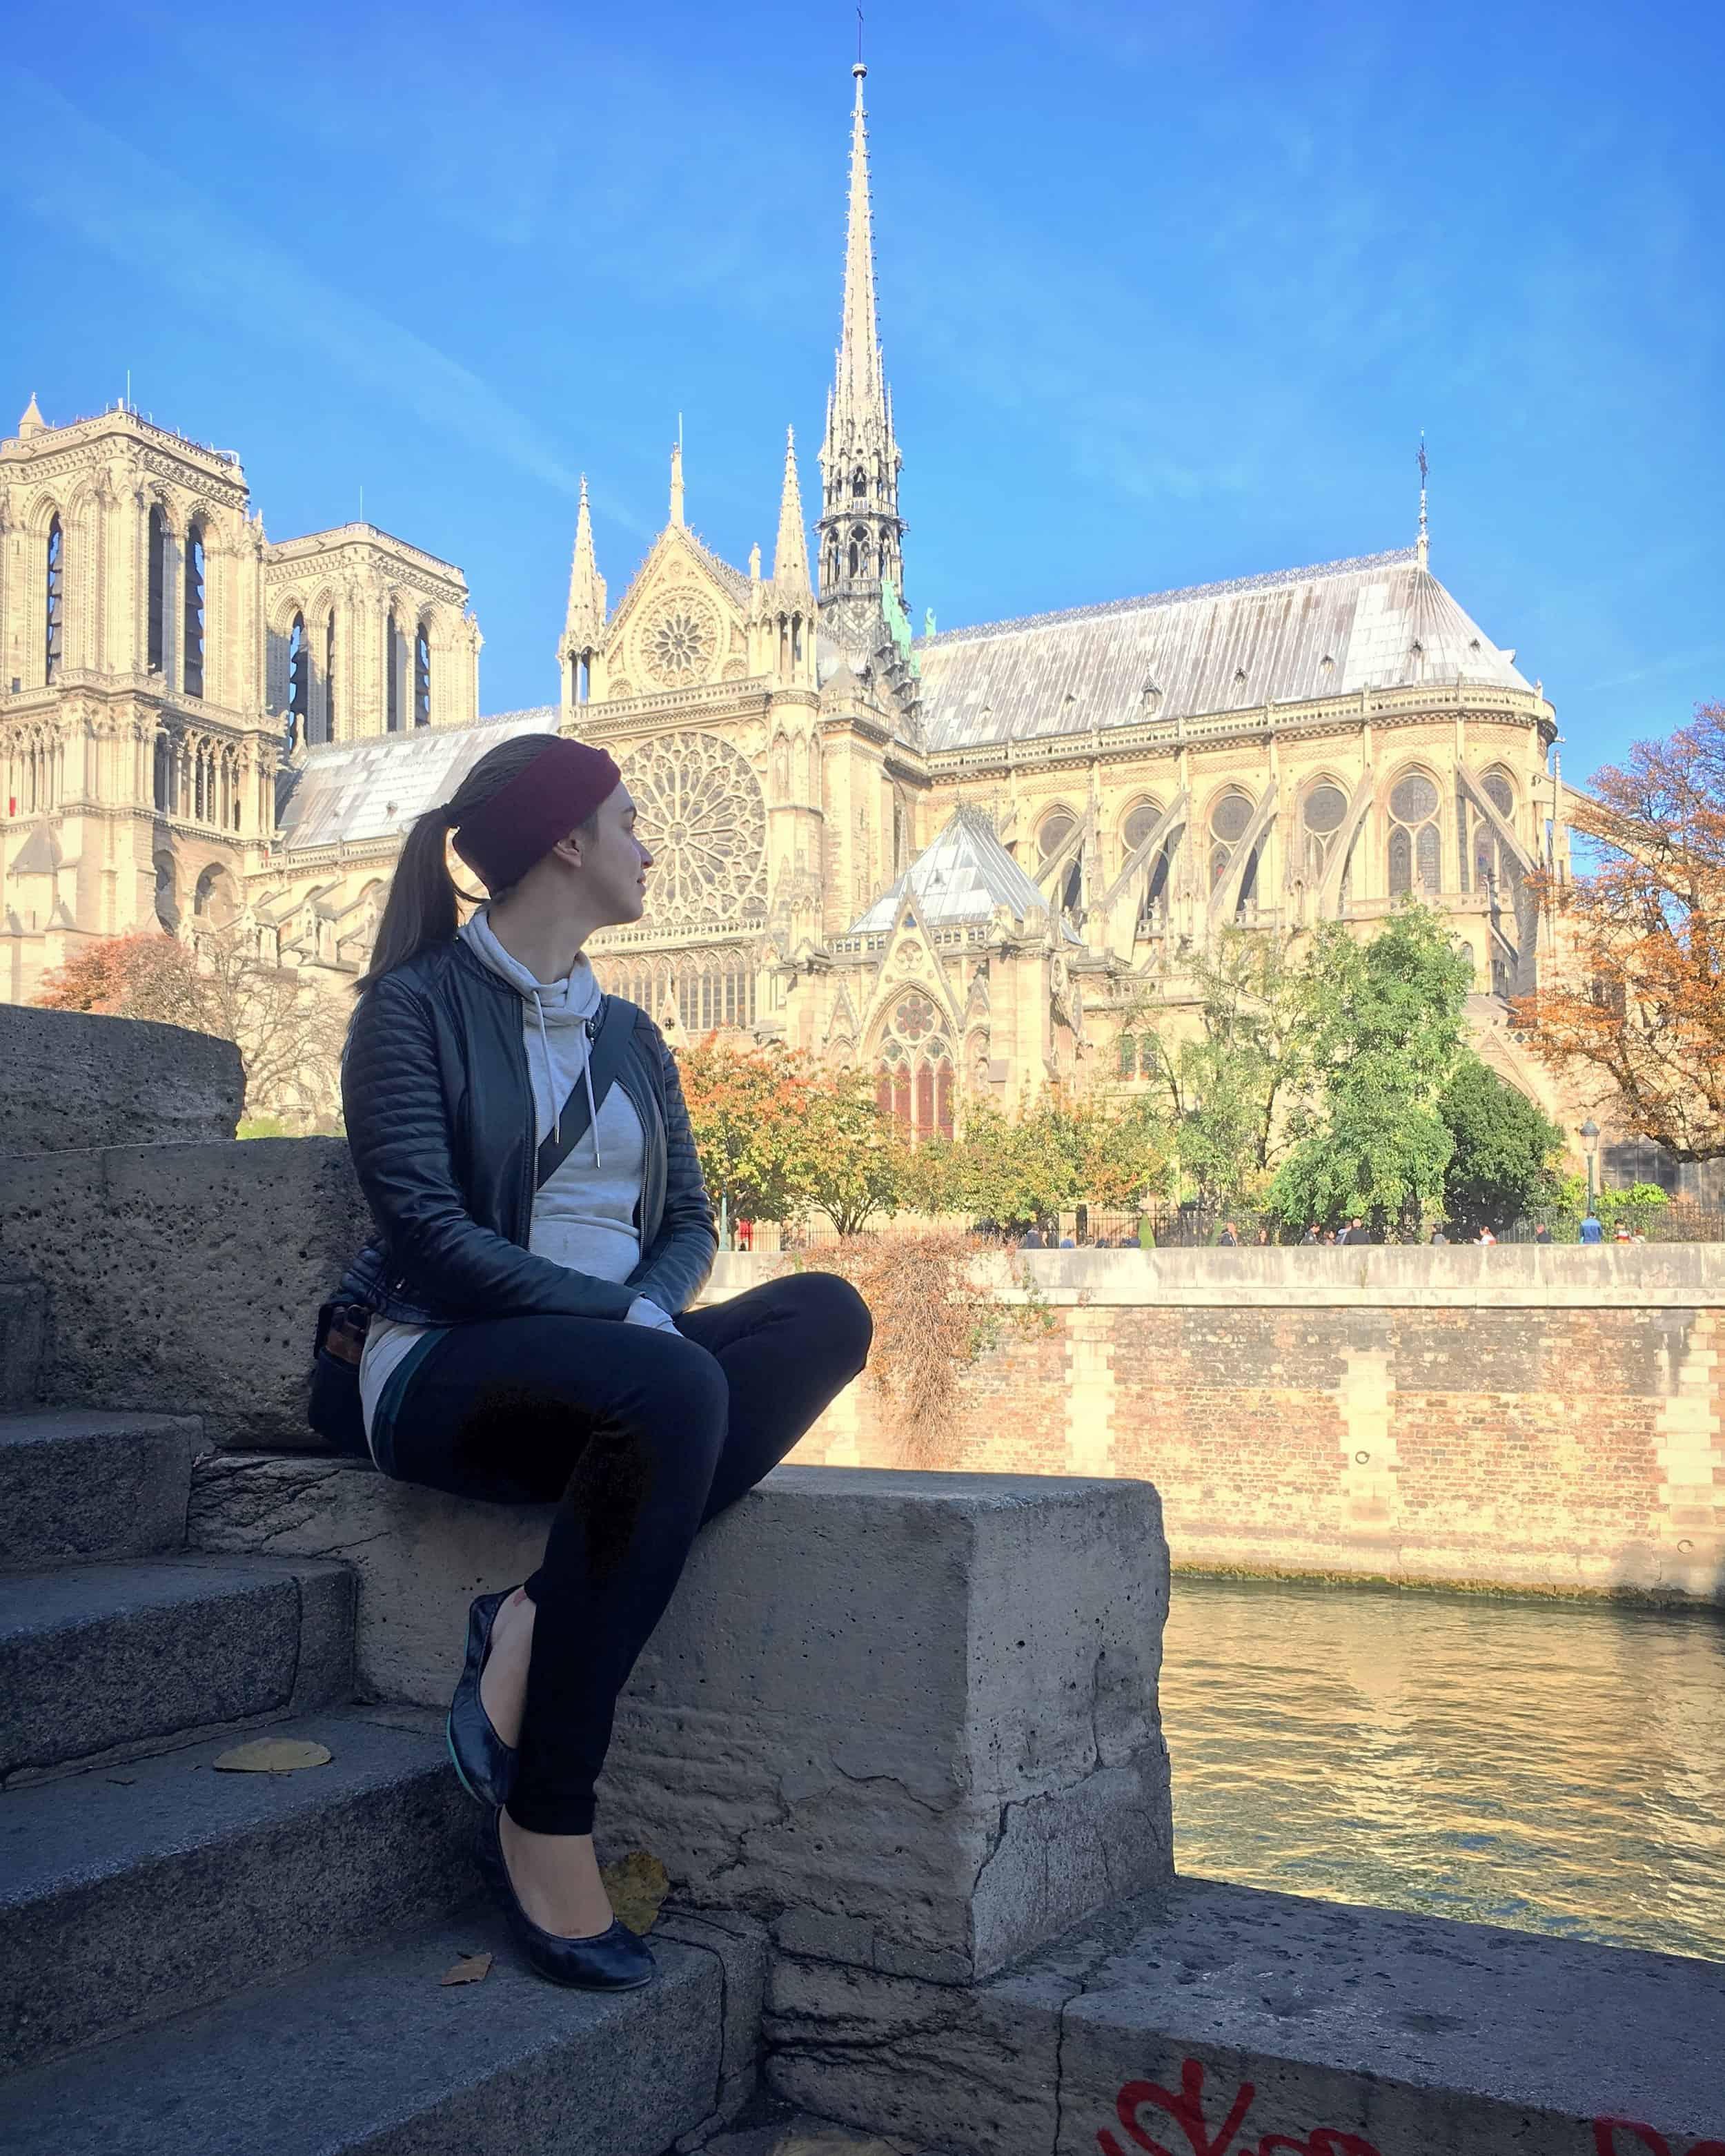 Tieks Review - Wearing Tieks in Paris